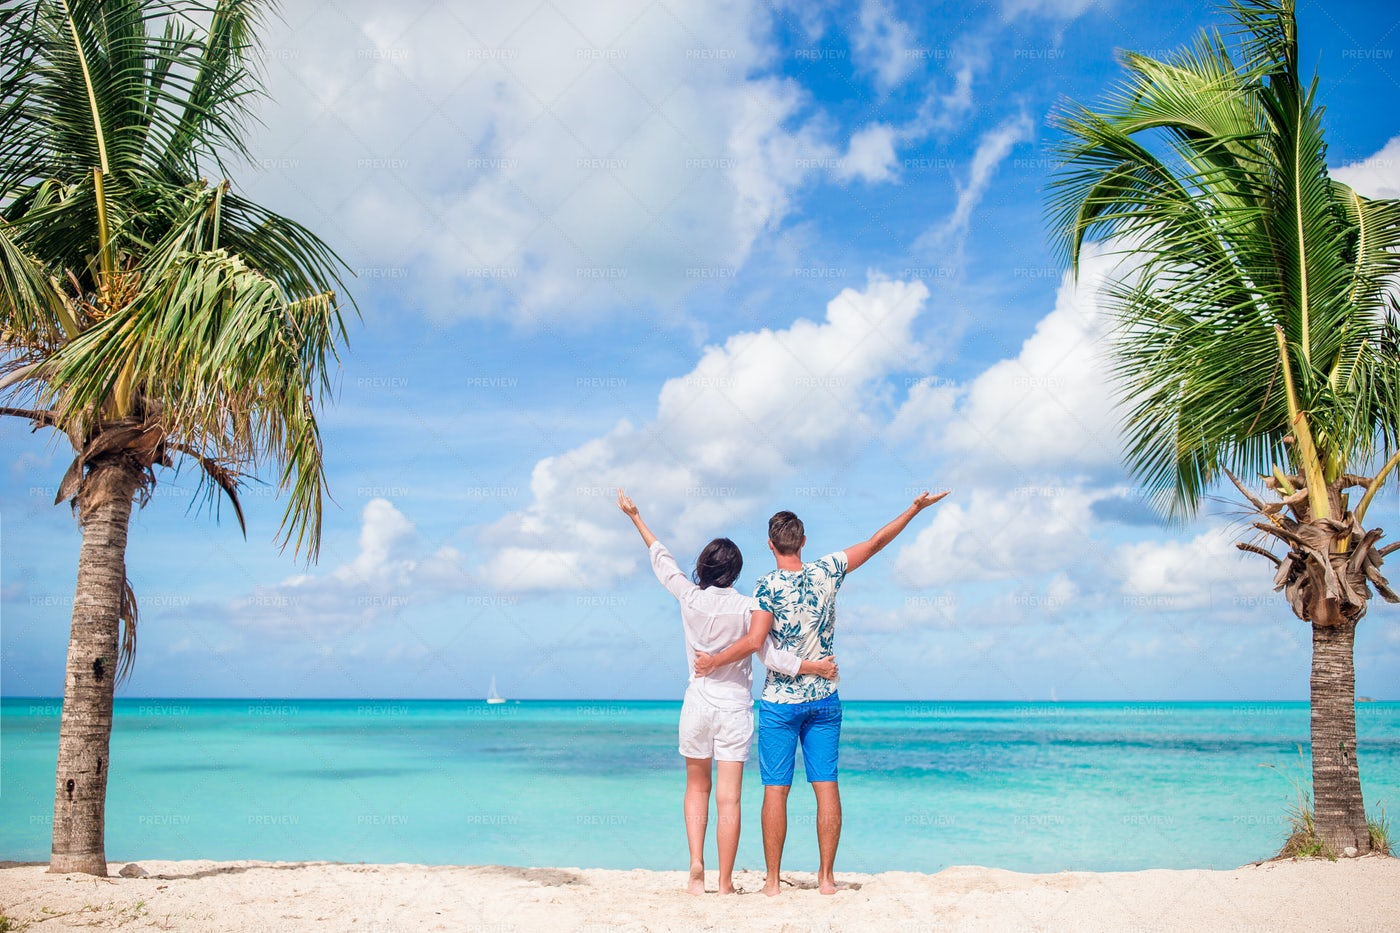 Couple Enjoying The Beach: Stock Photos